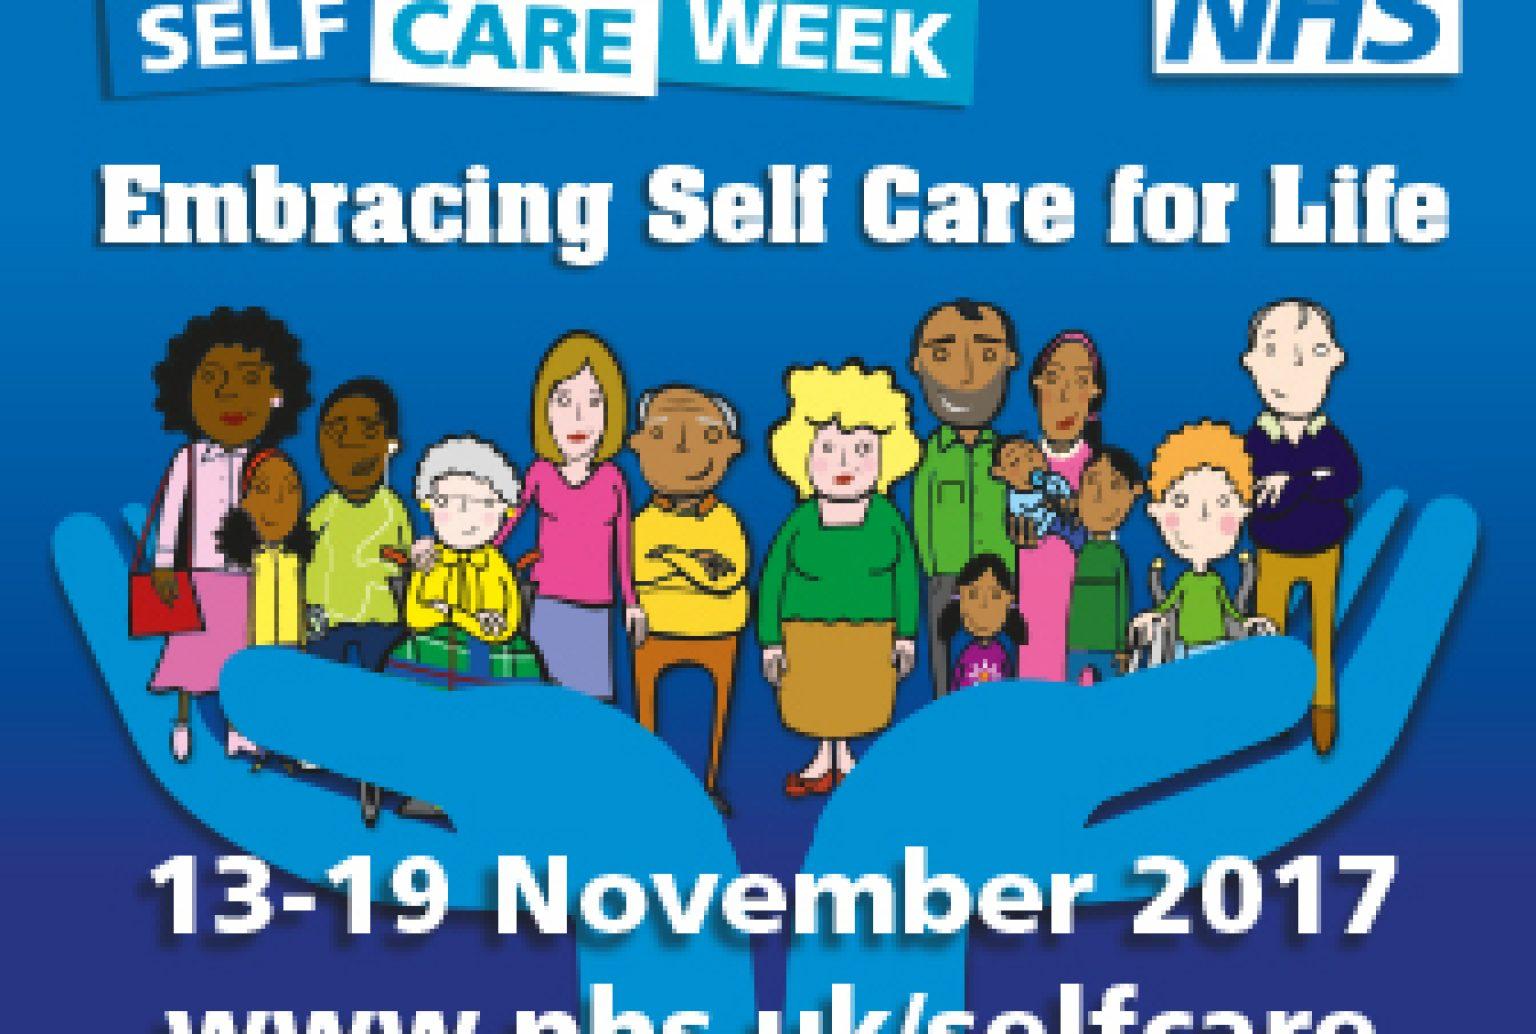 Self Care Week 2017